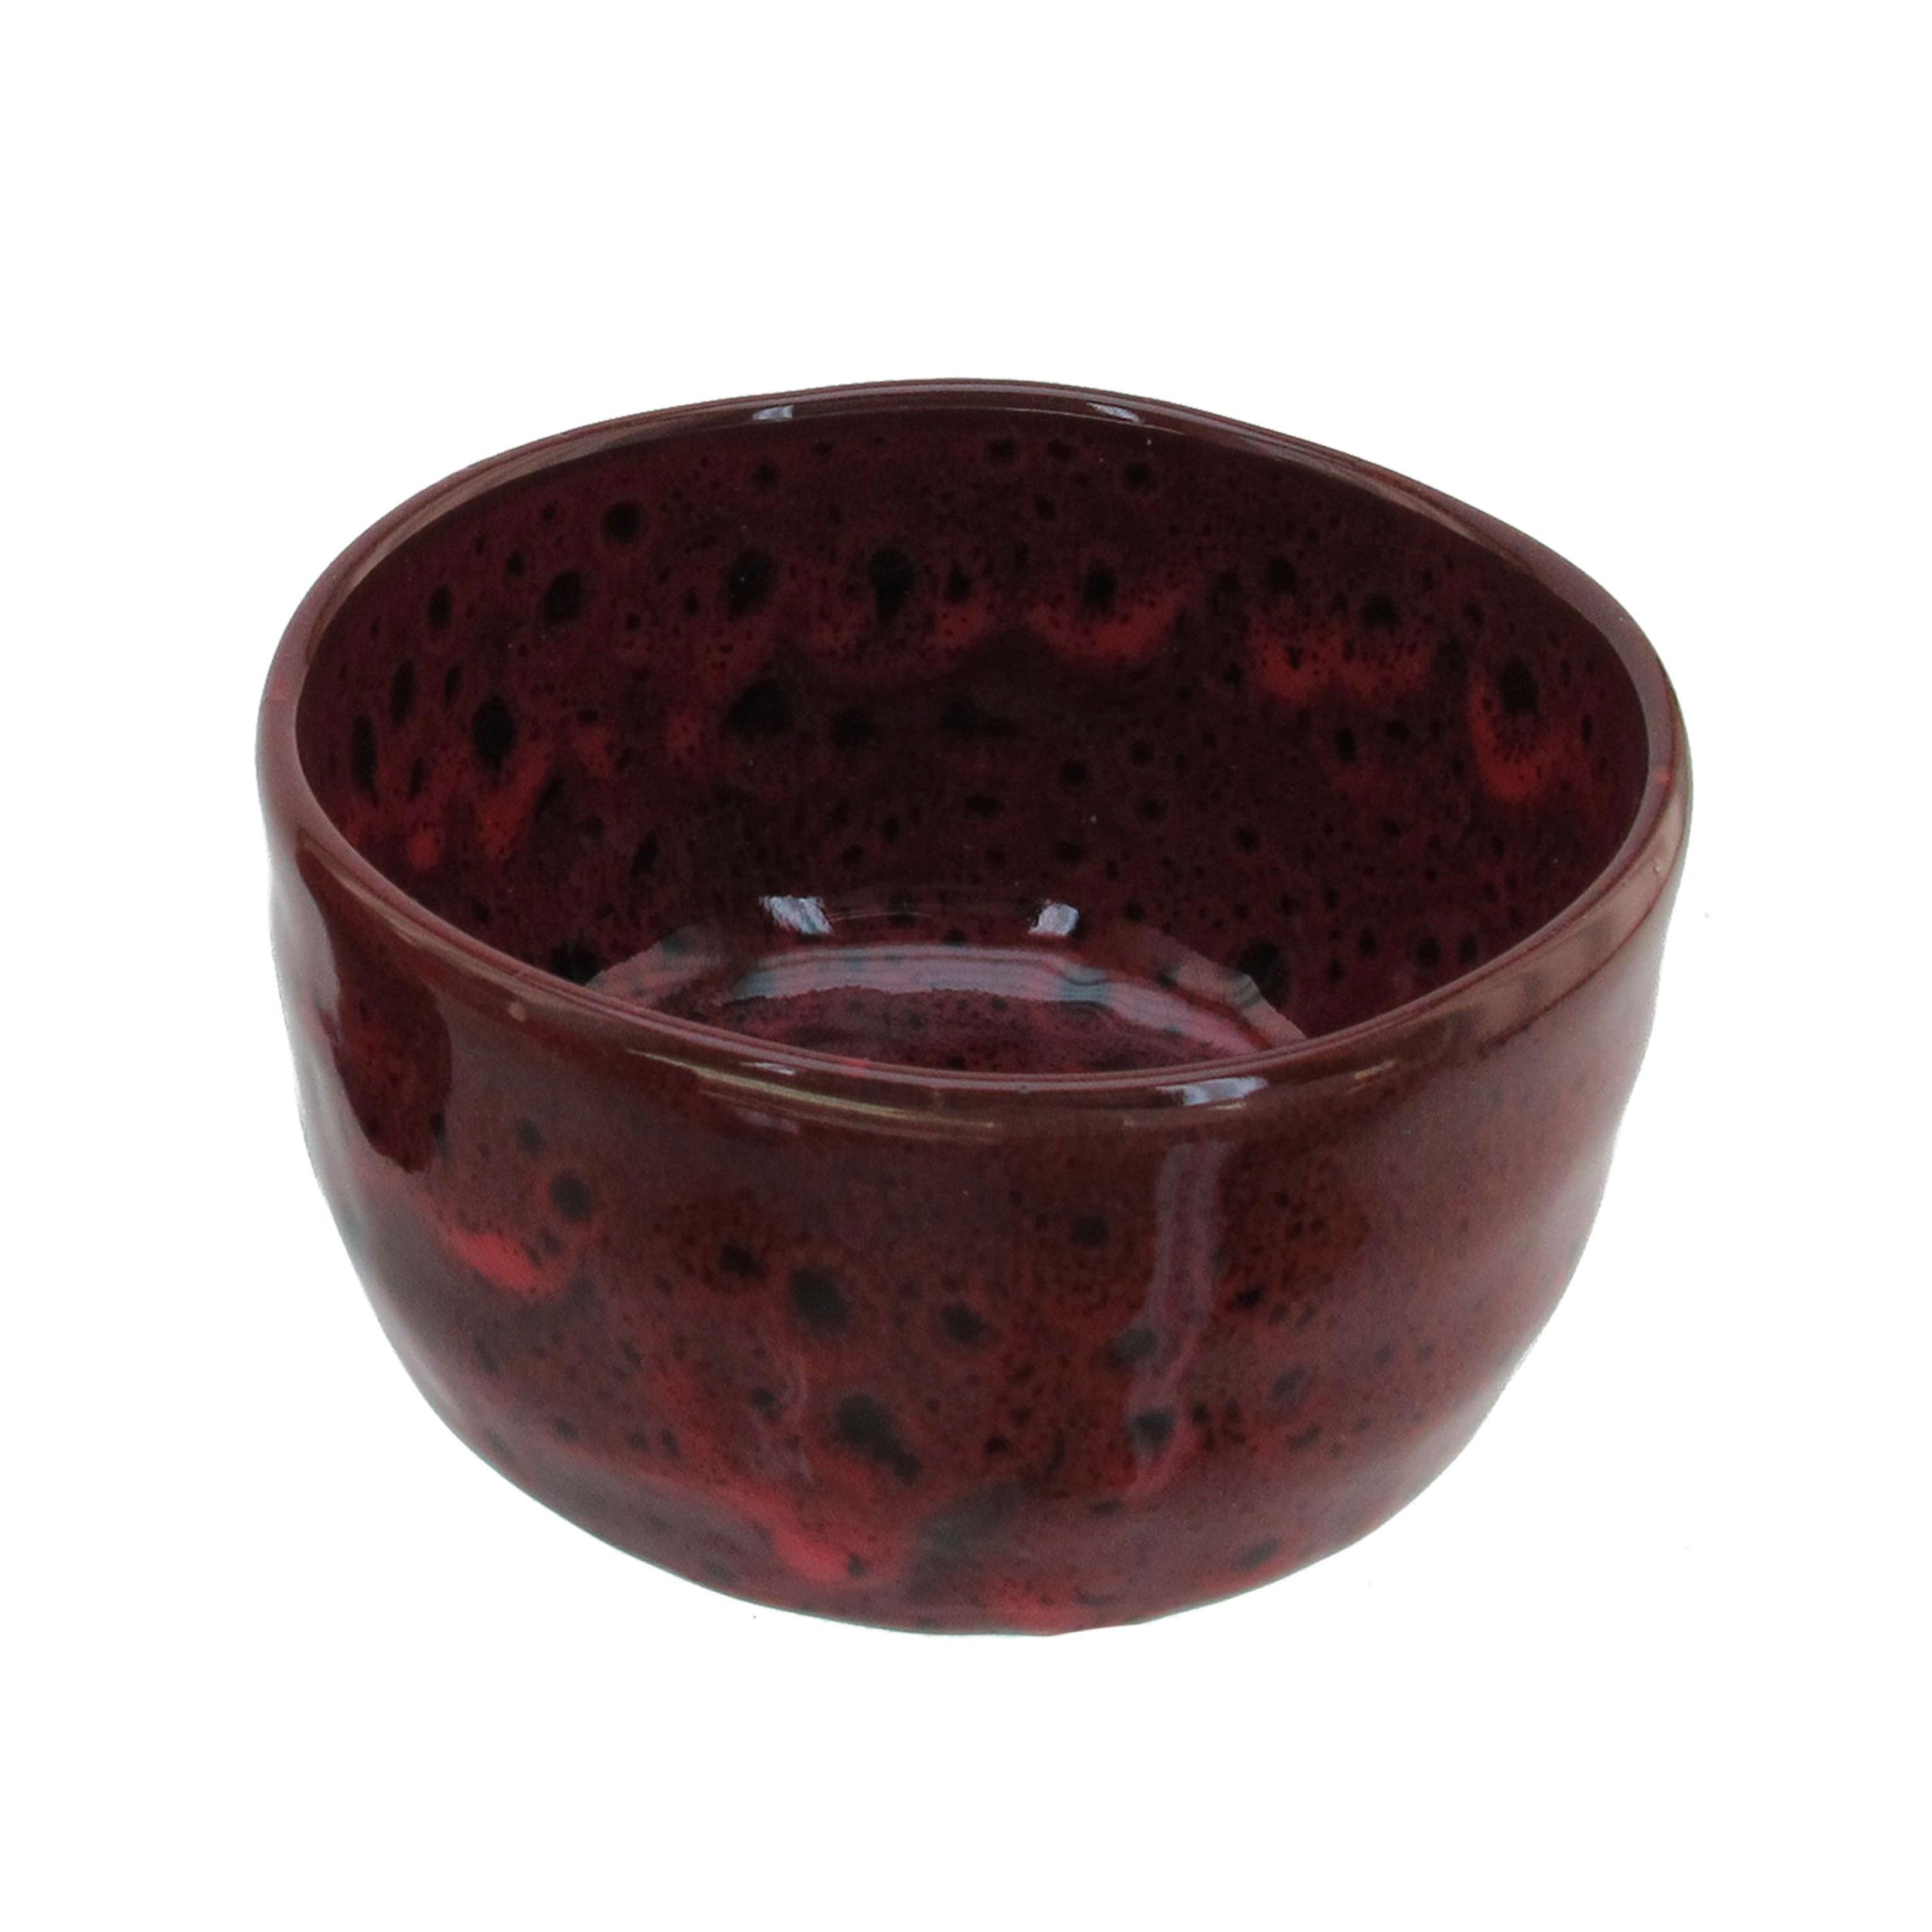 BambooMN Brand - Matcha Green Tea Whisk Set - Whisk + Scoop + Tea Spoon + Black Bowl